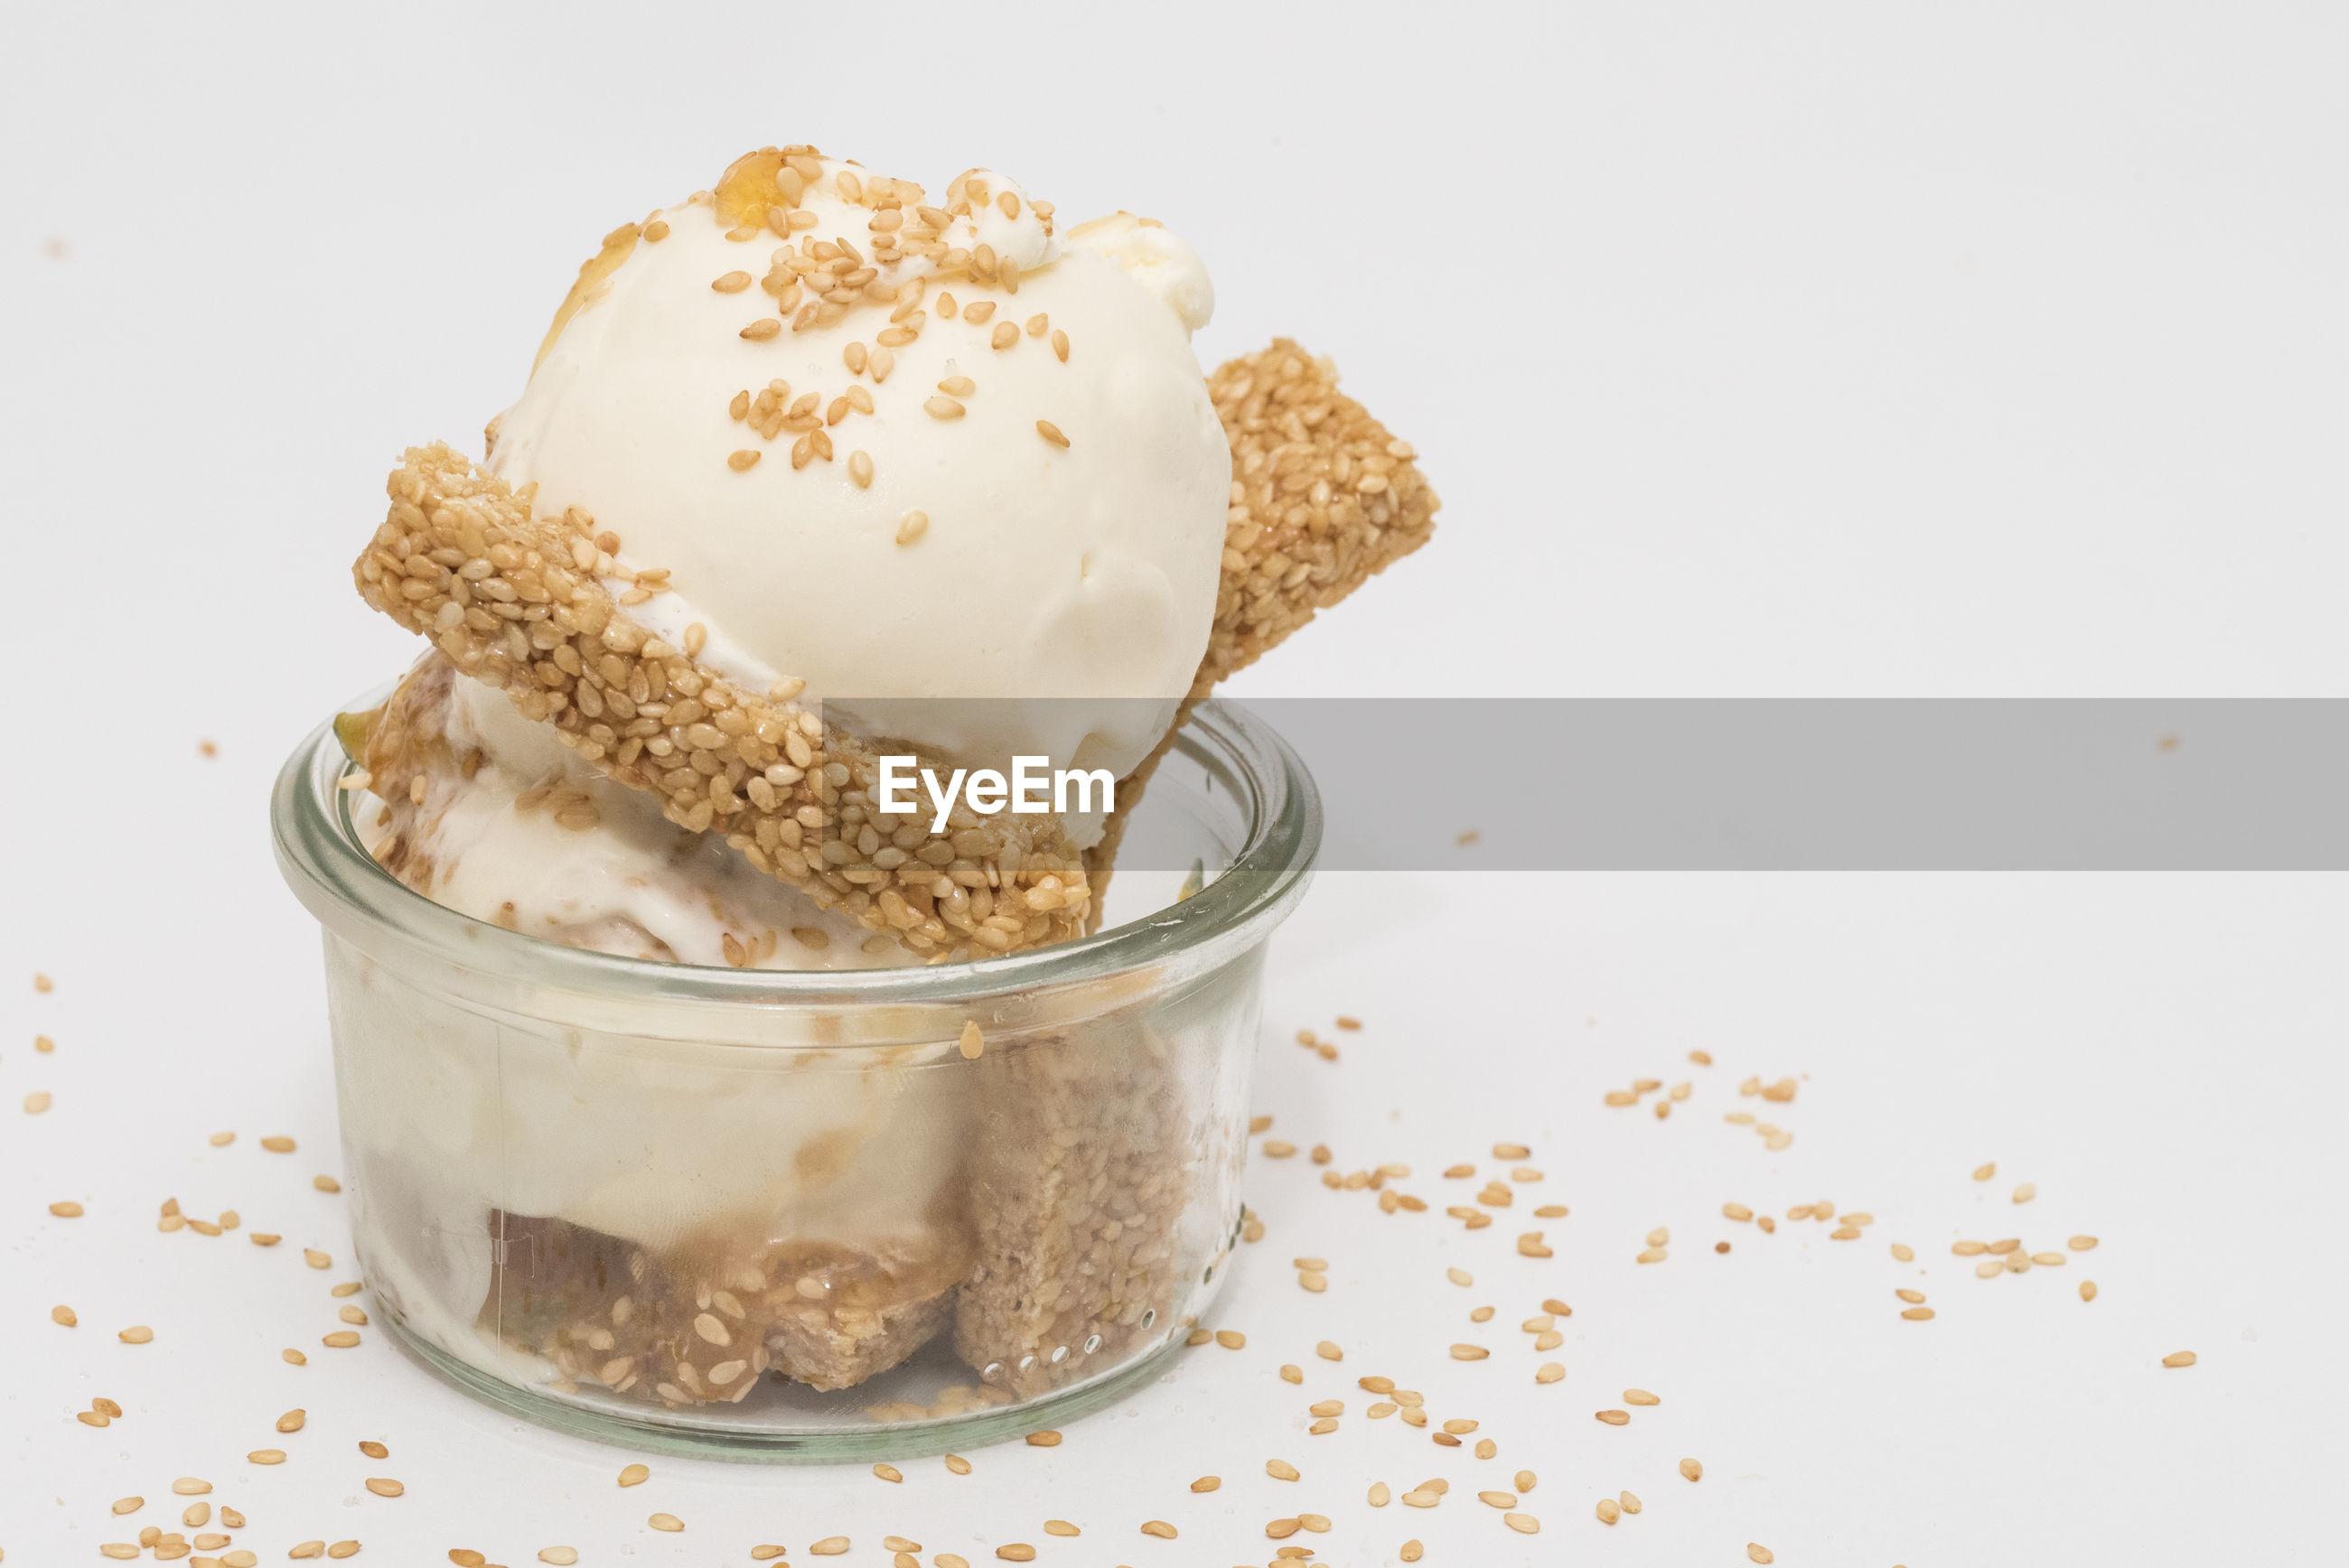 Close-up of ice cream against white background